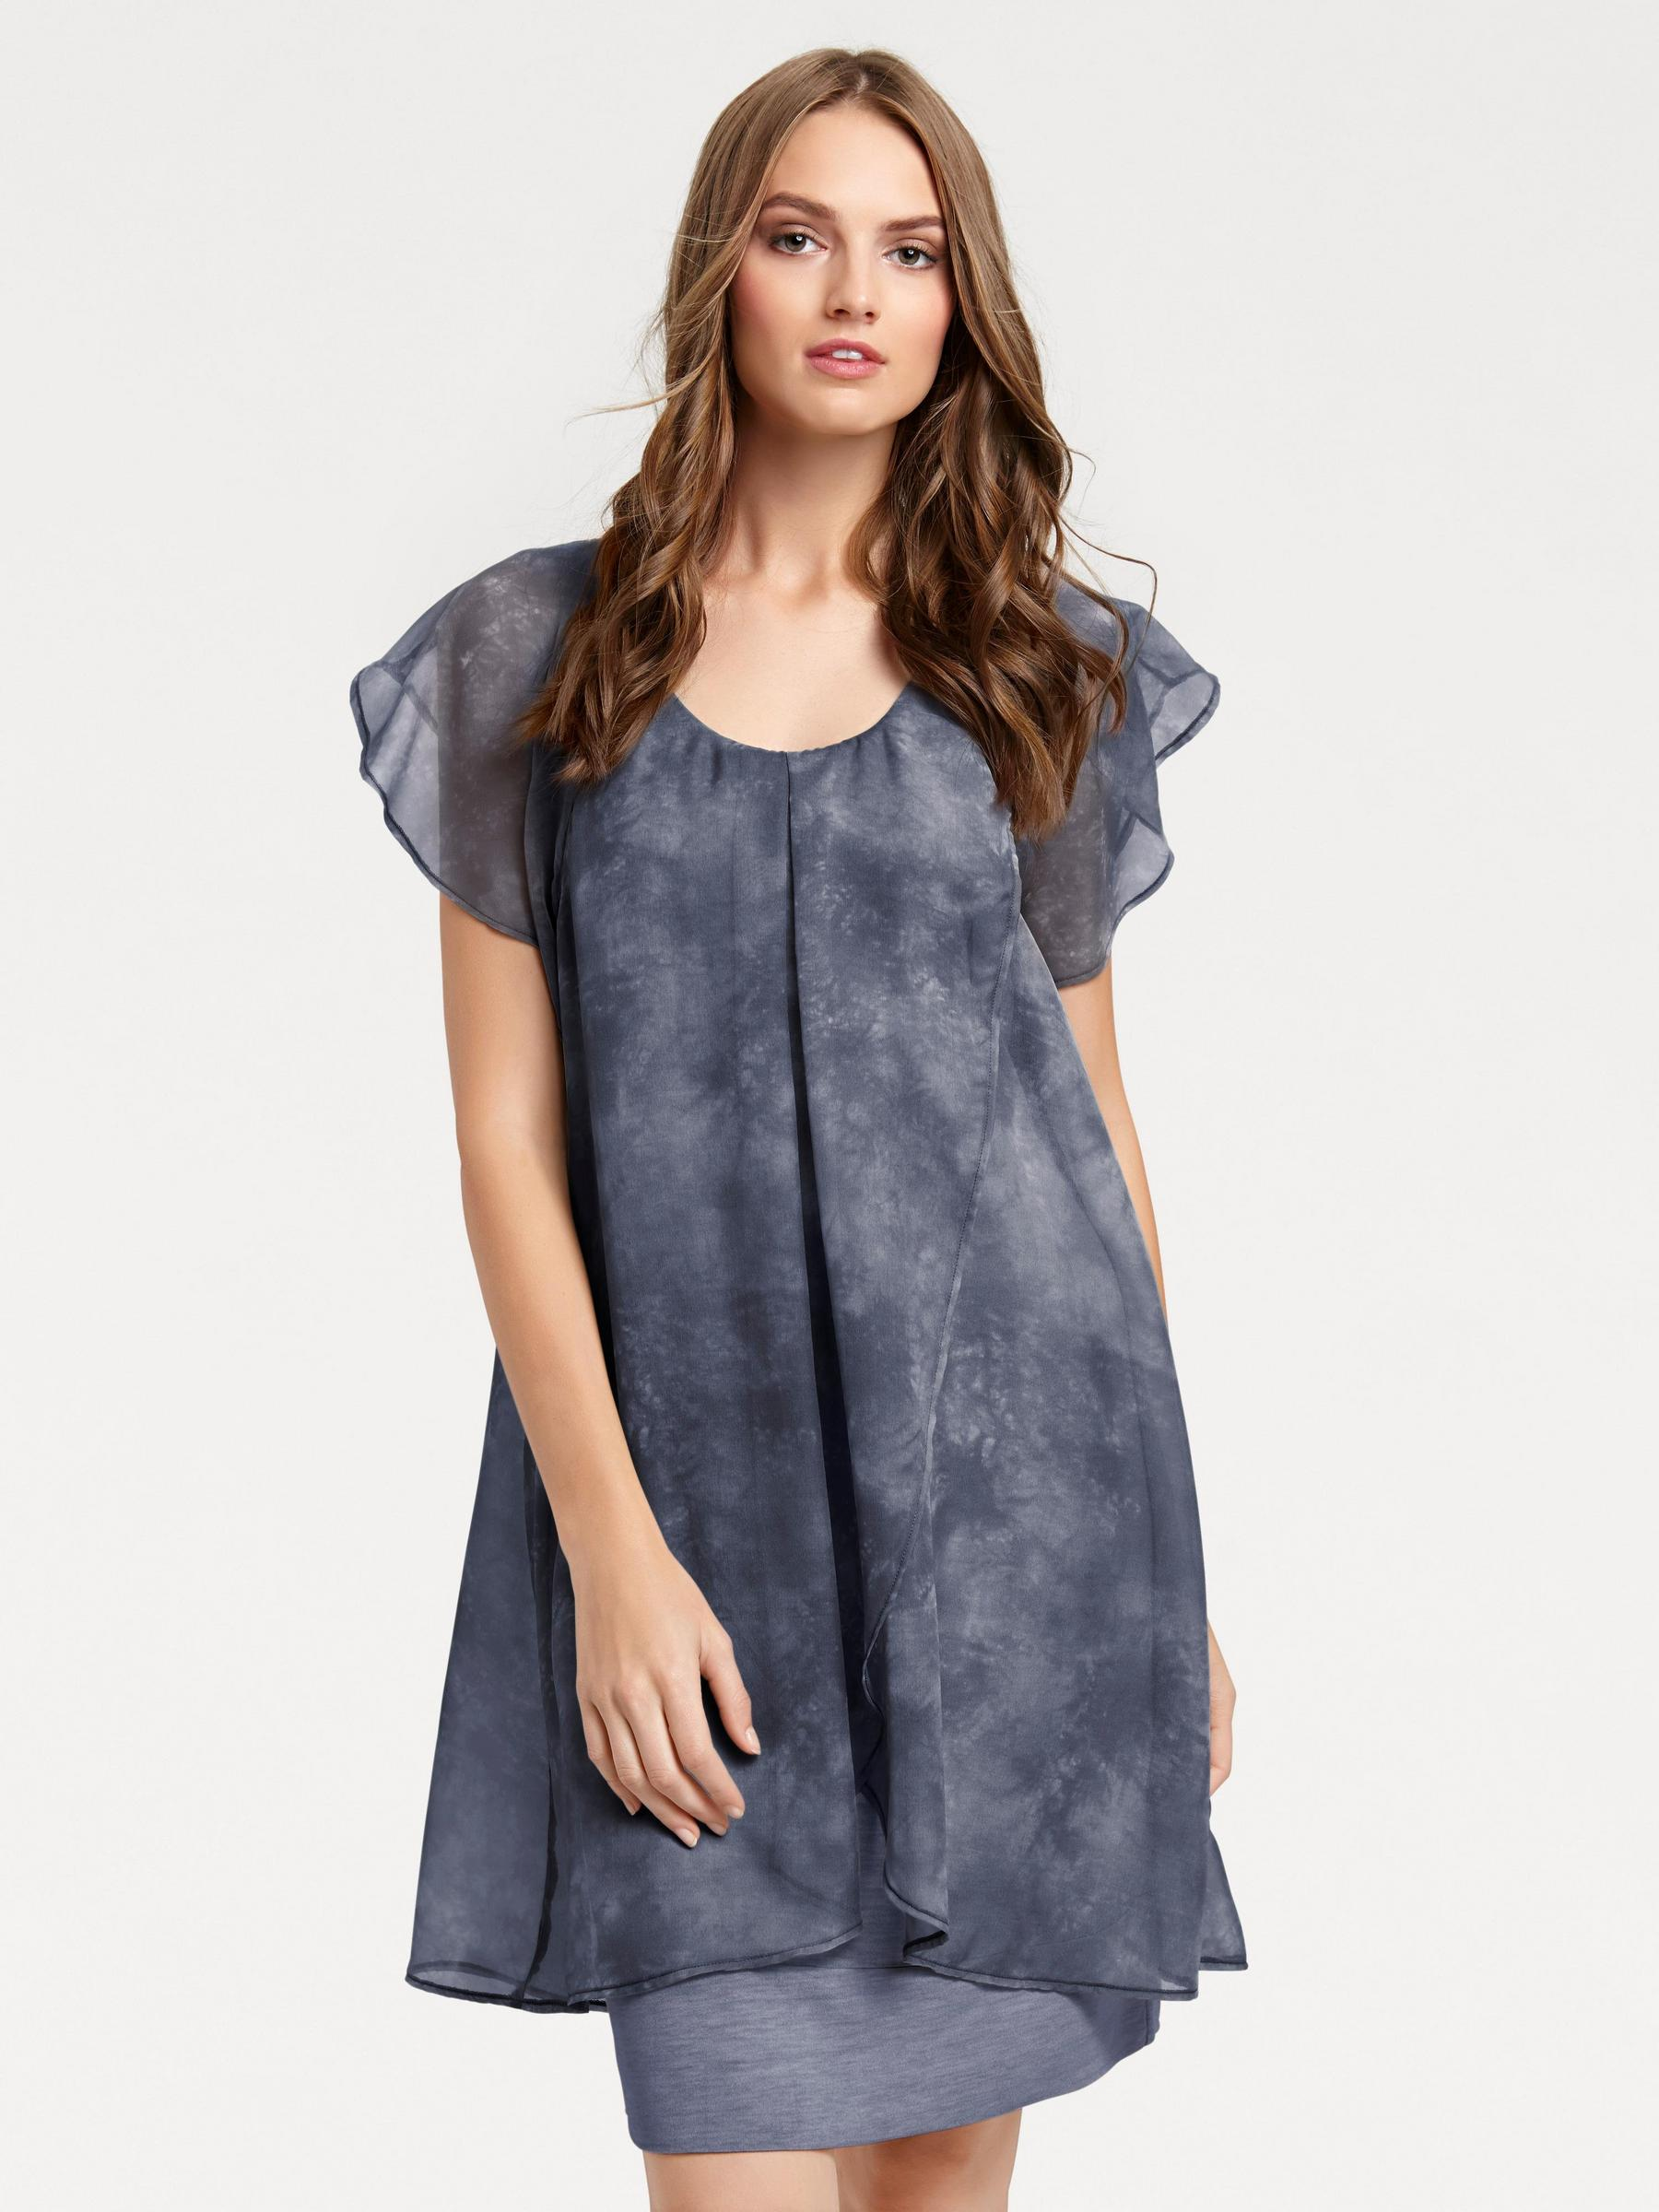 Kleid im Lagen-Look Gr. 42